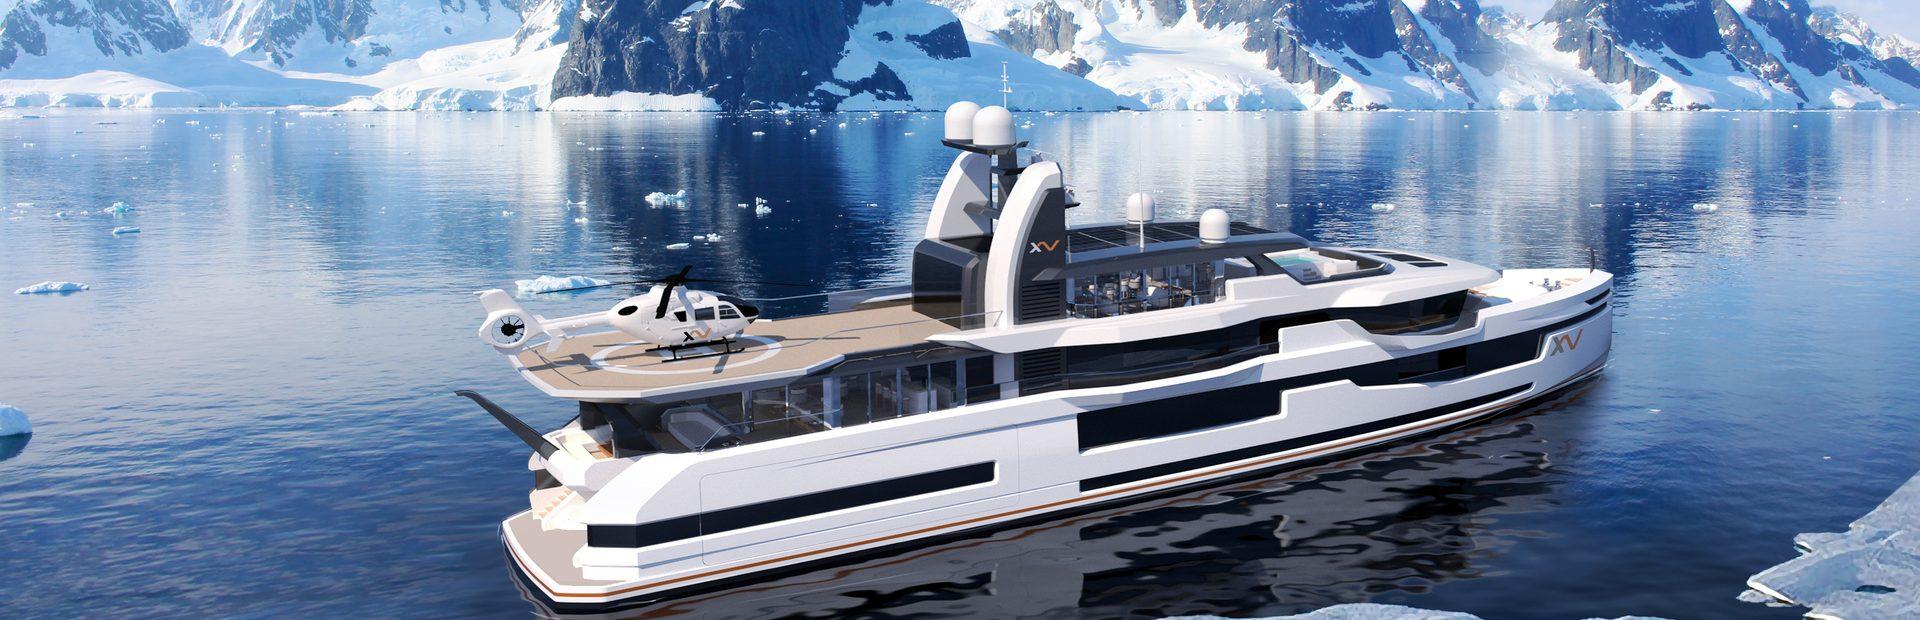 Xventure 57m Yacht Charter